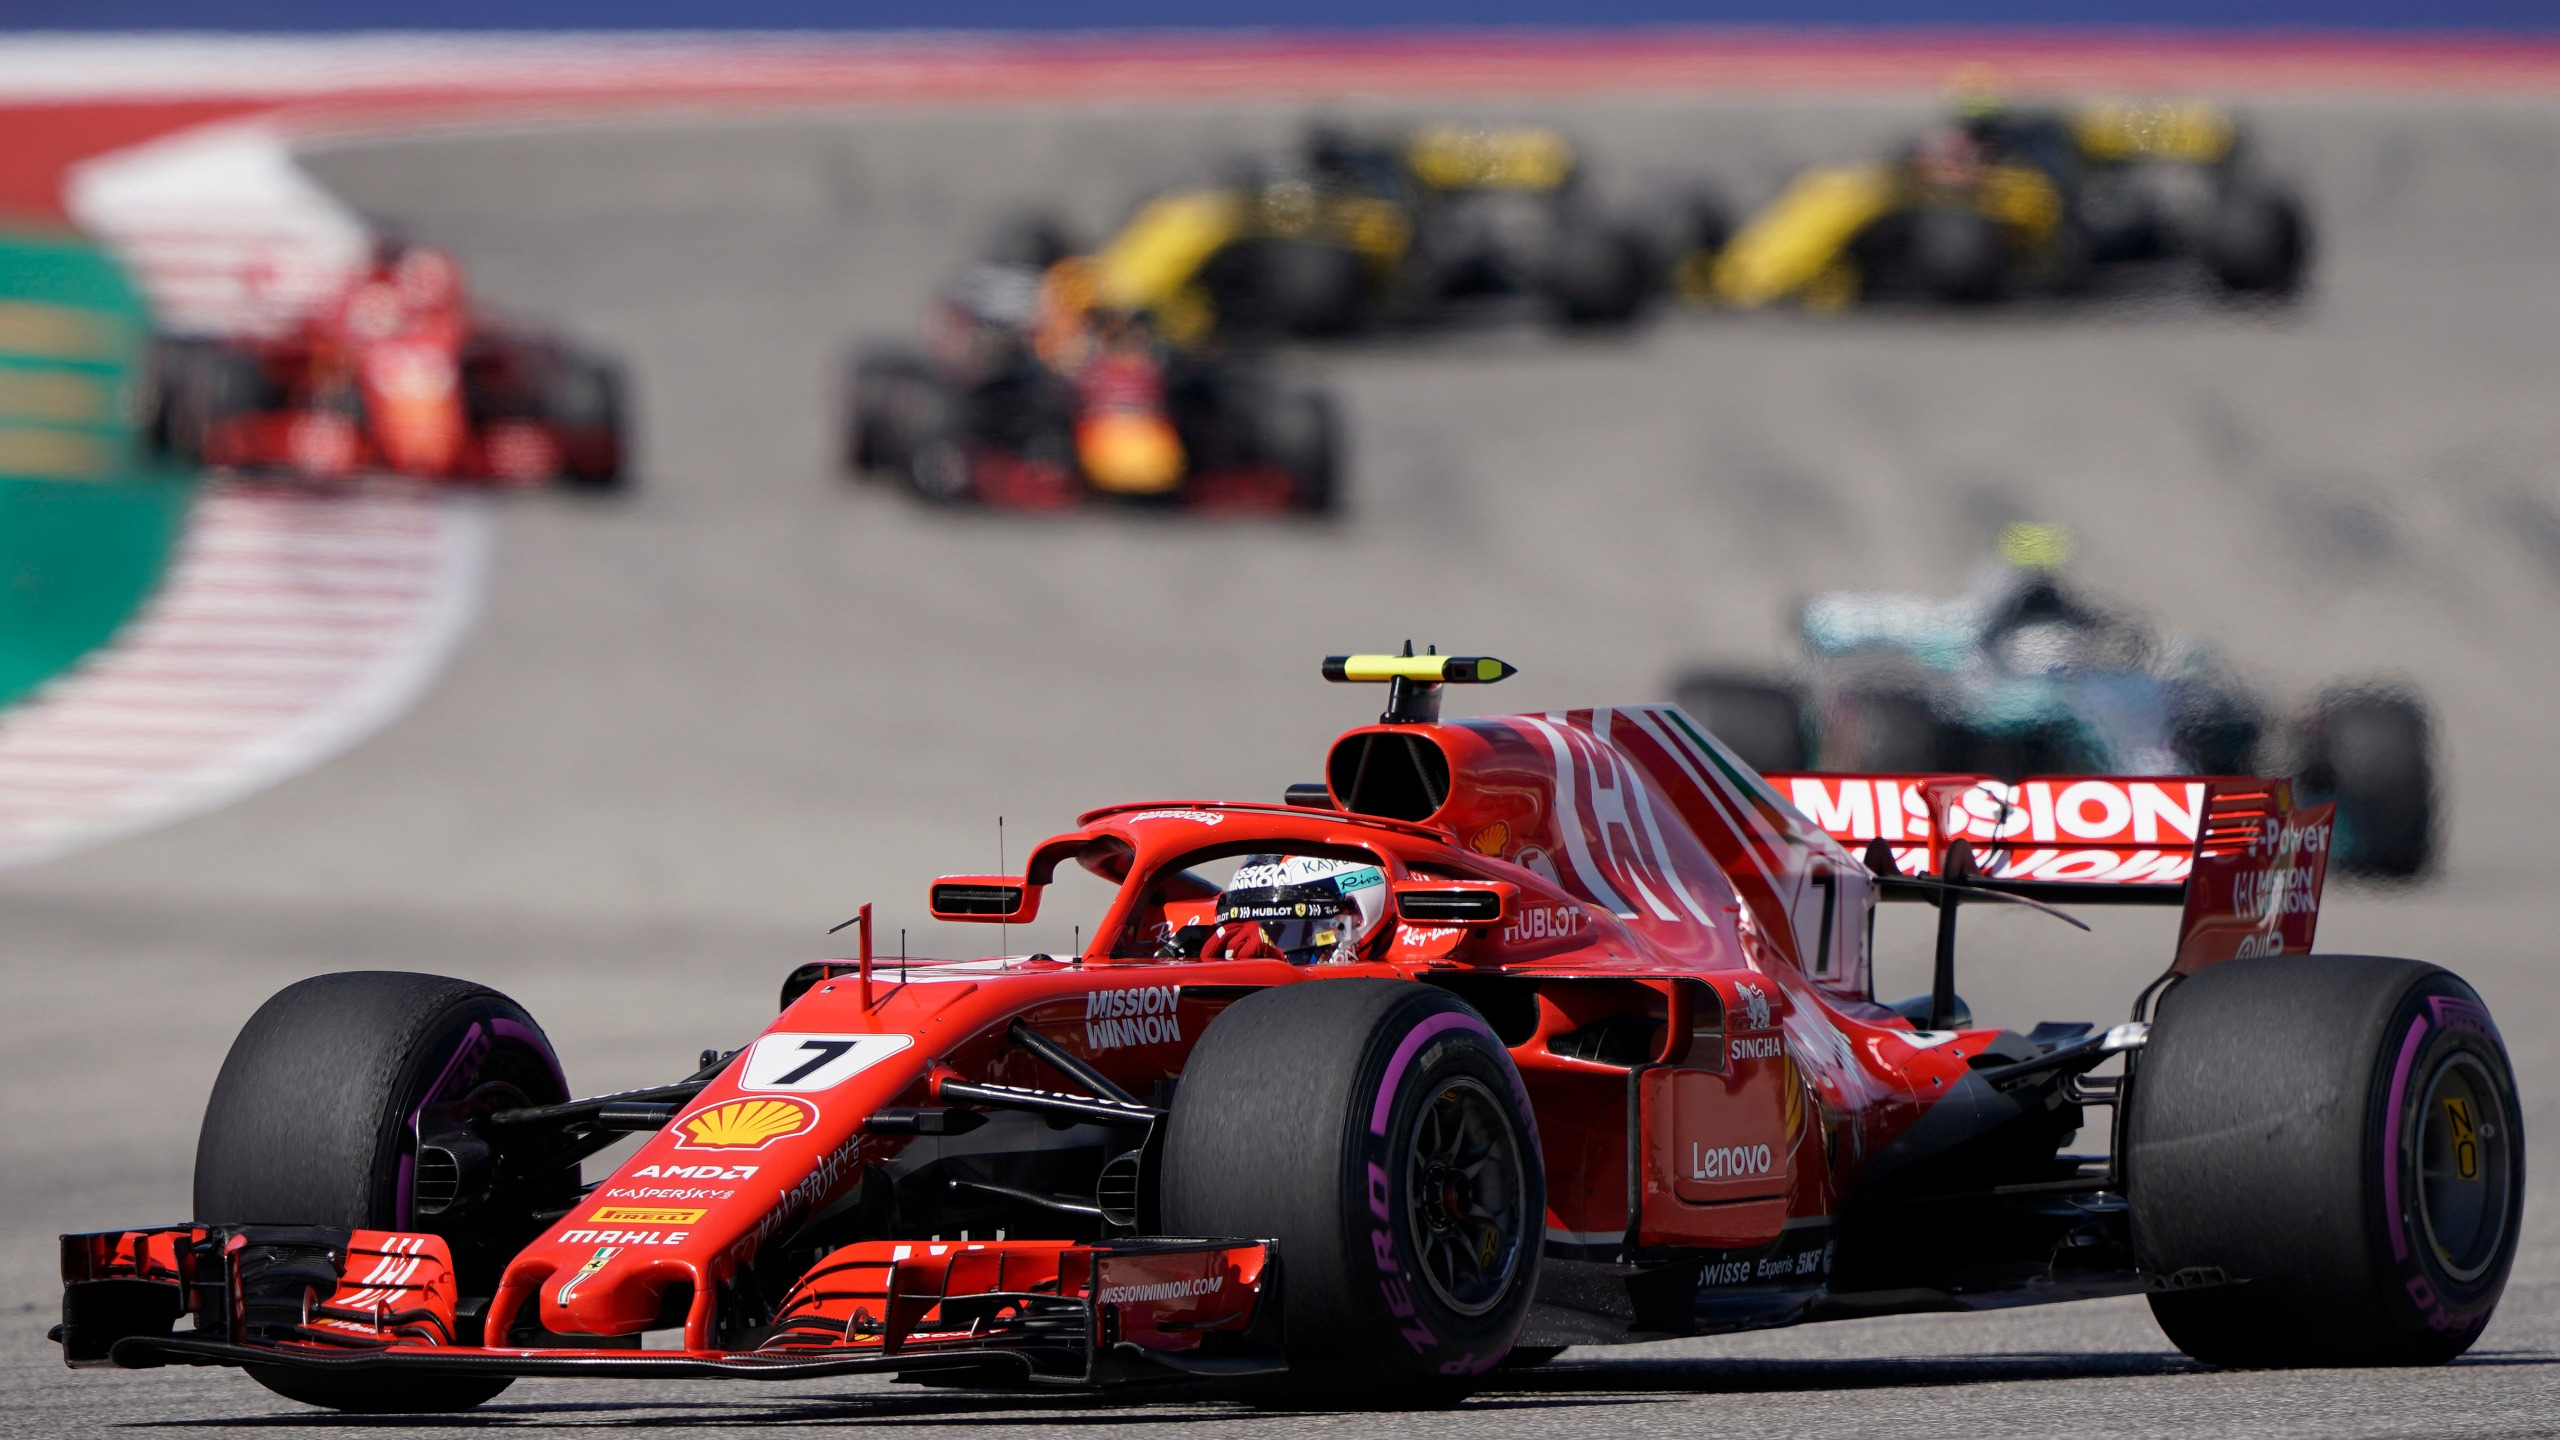 F1 US Grand Prix Auto Racing_1540157279378